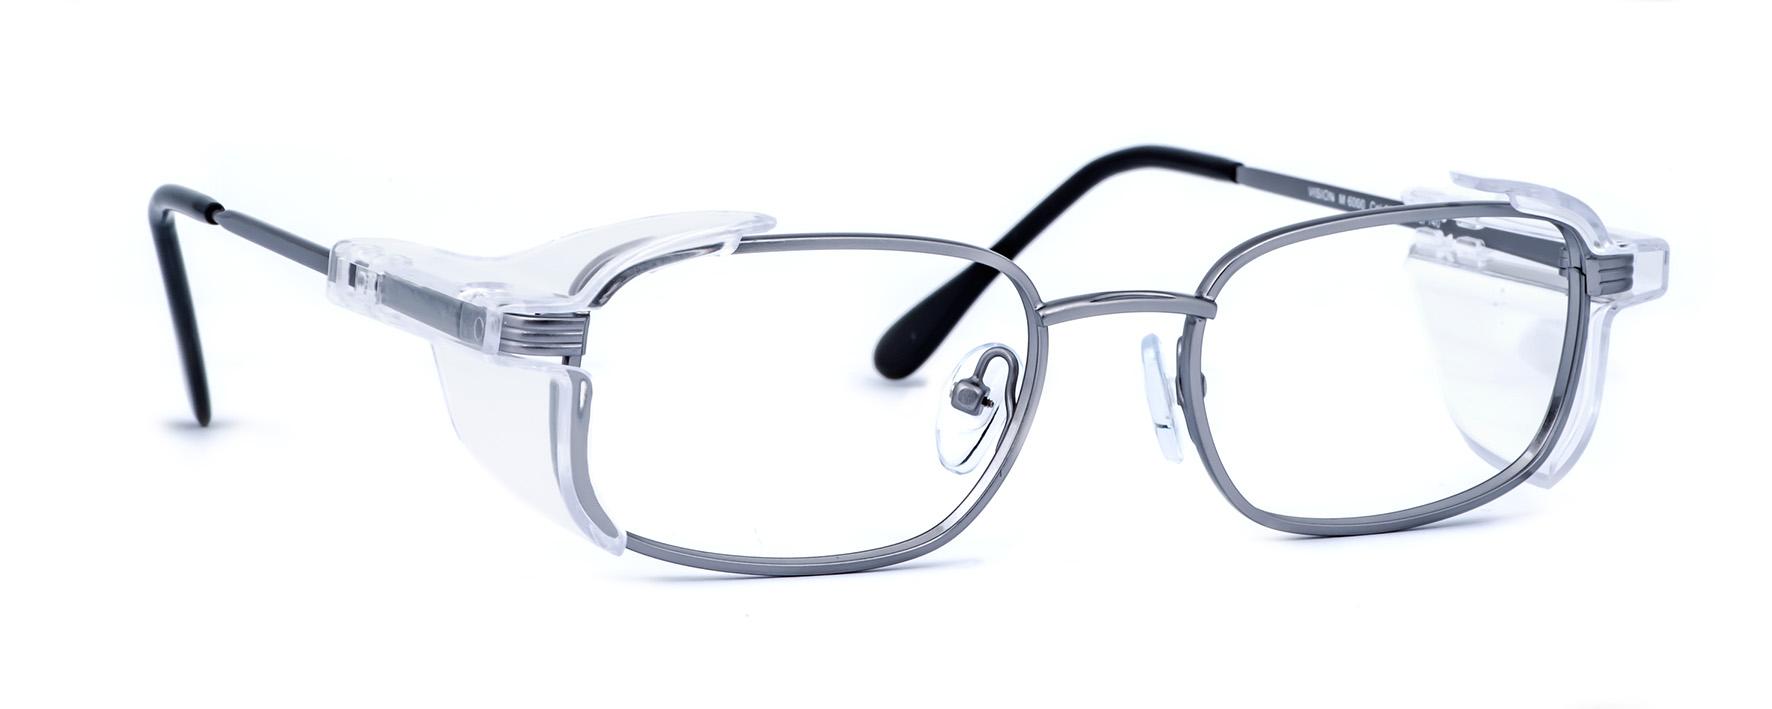 6000-02-5000-VISION-M-6000-silber